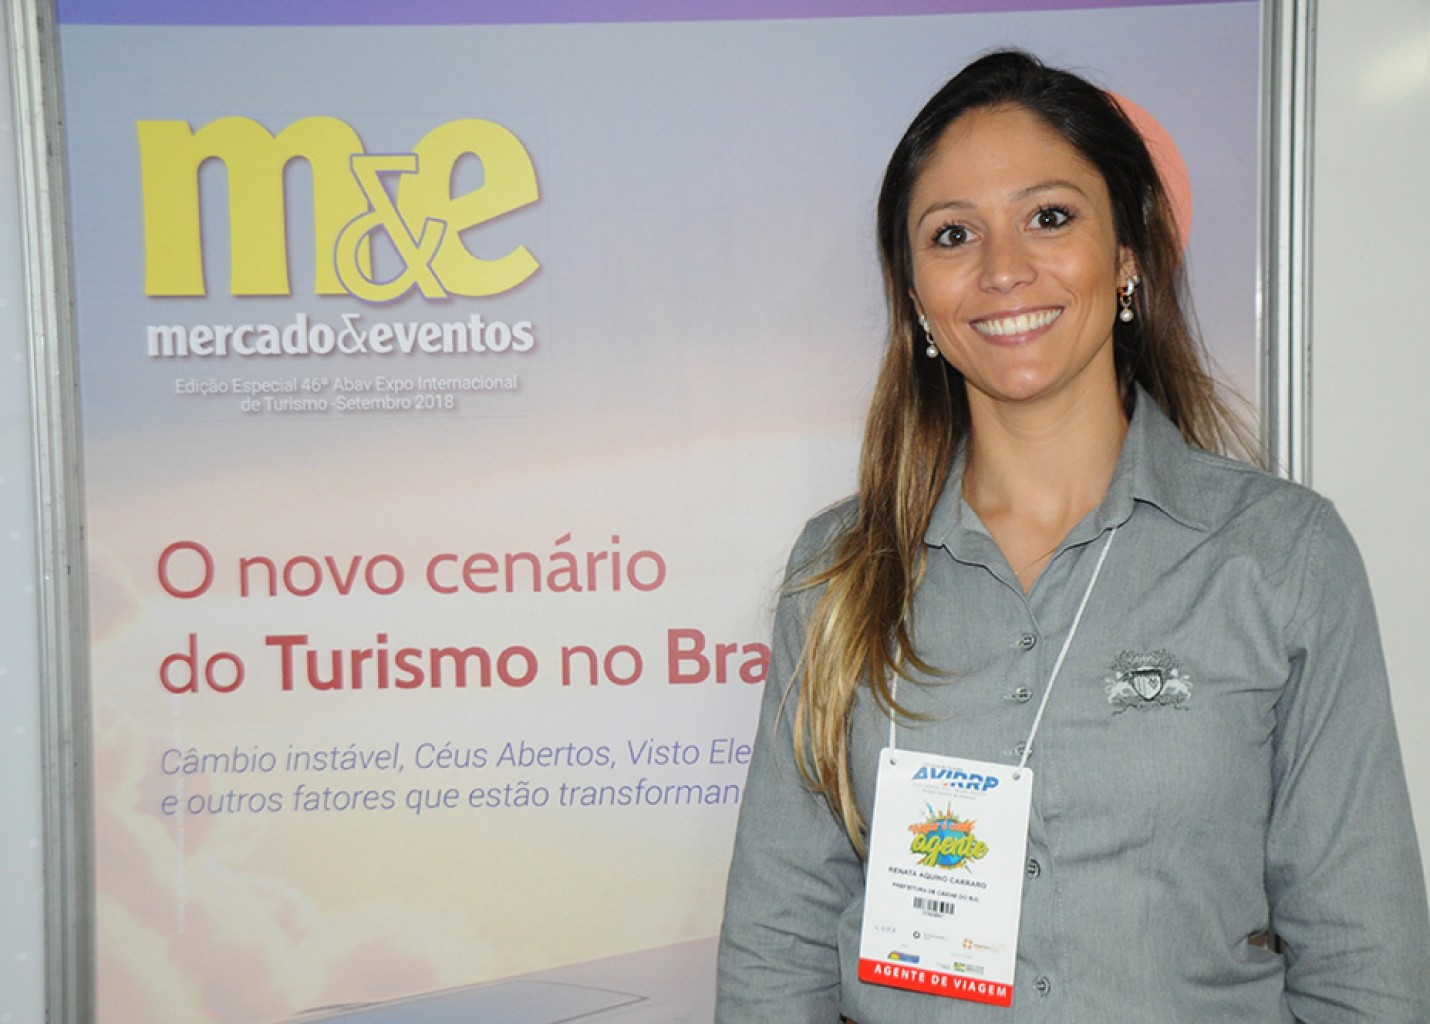 Caxias do Sul-RS prepara novo aeroporto e aposta no turismo religioso e corporativo